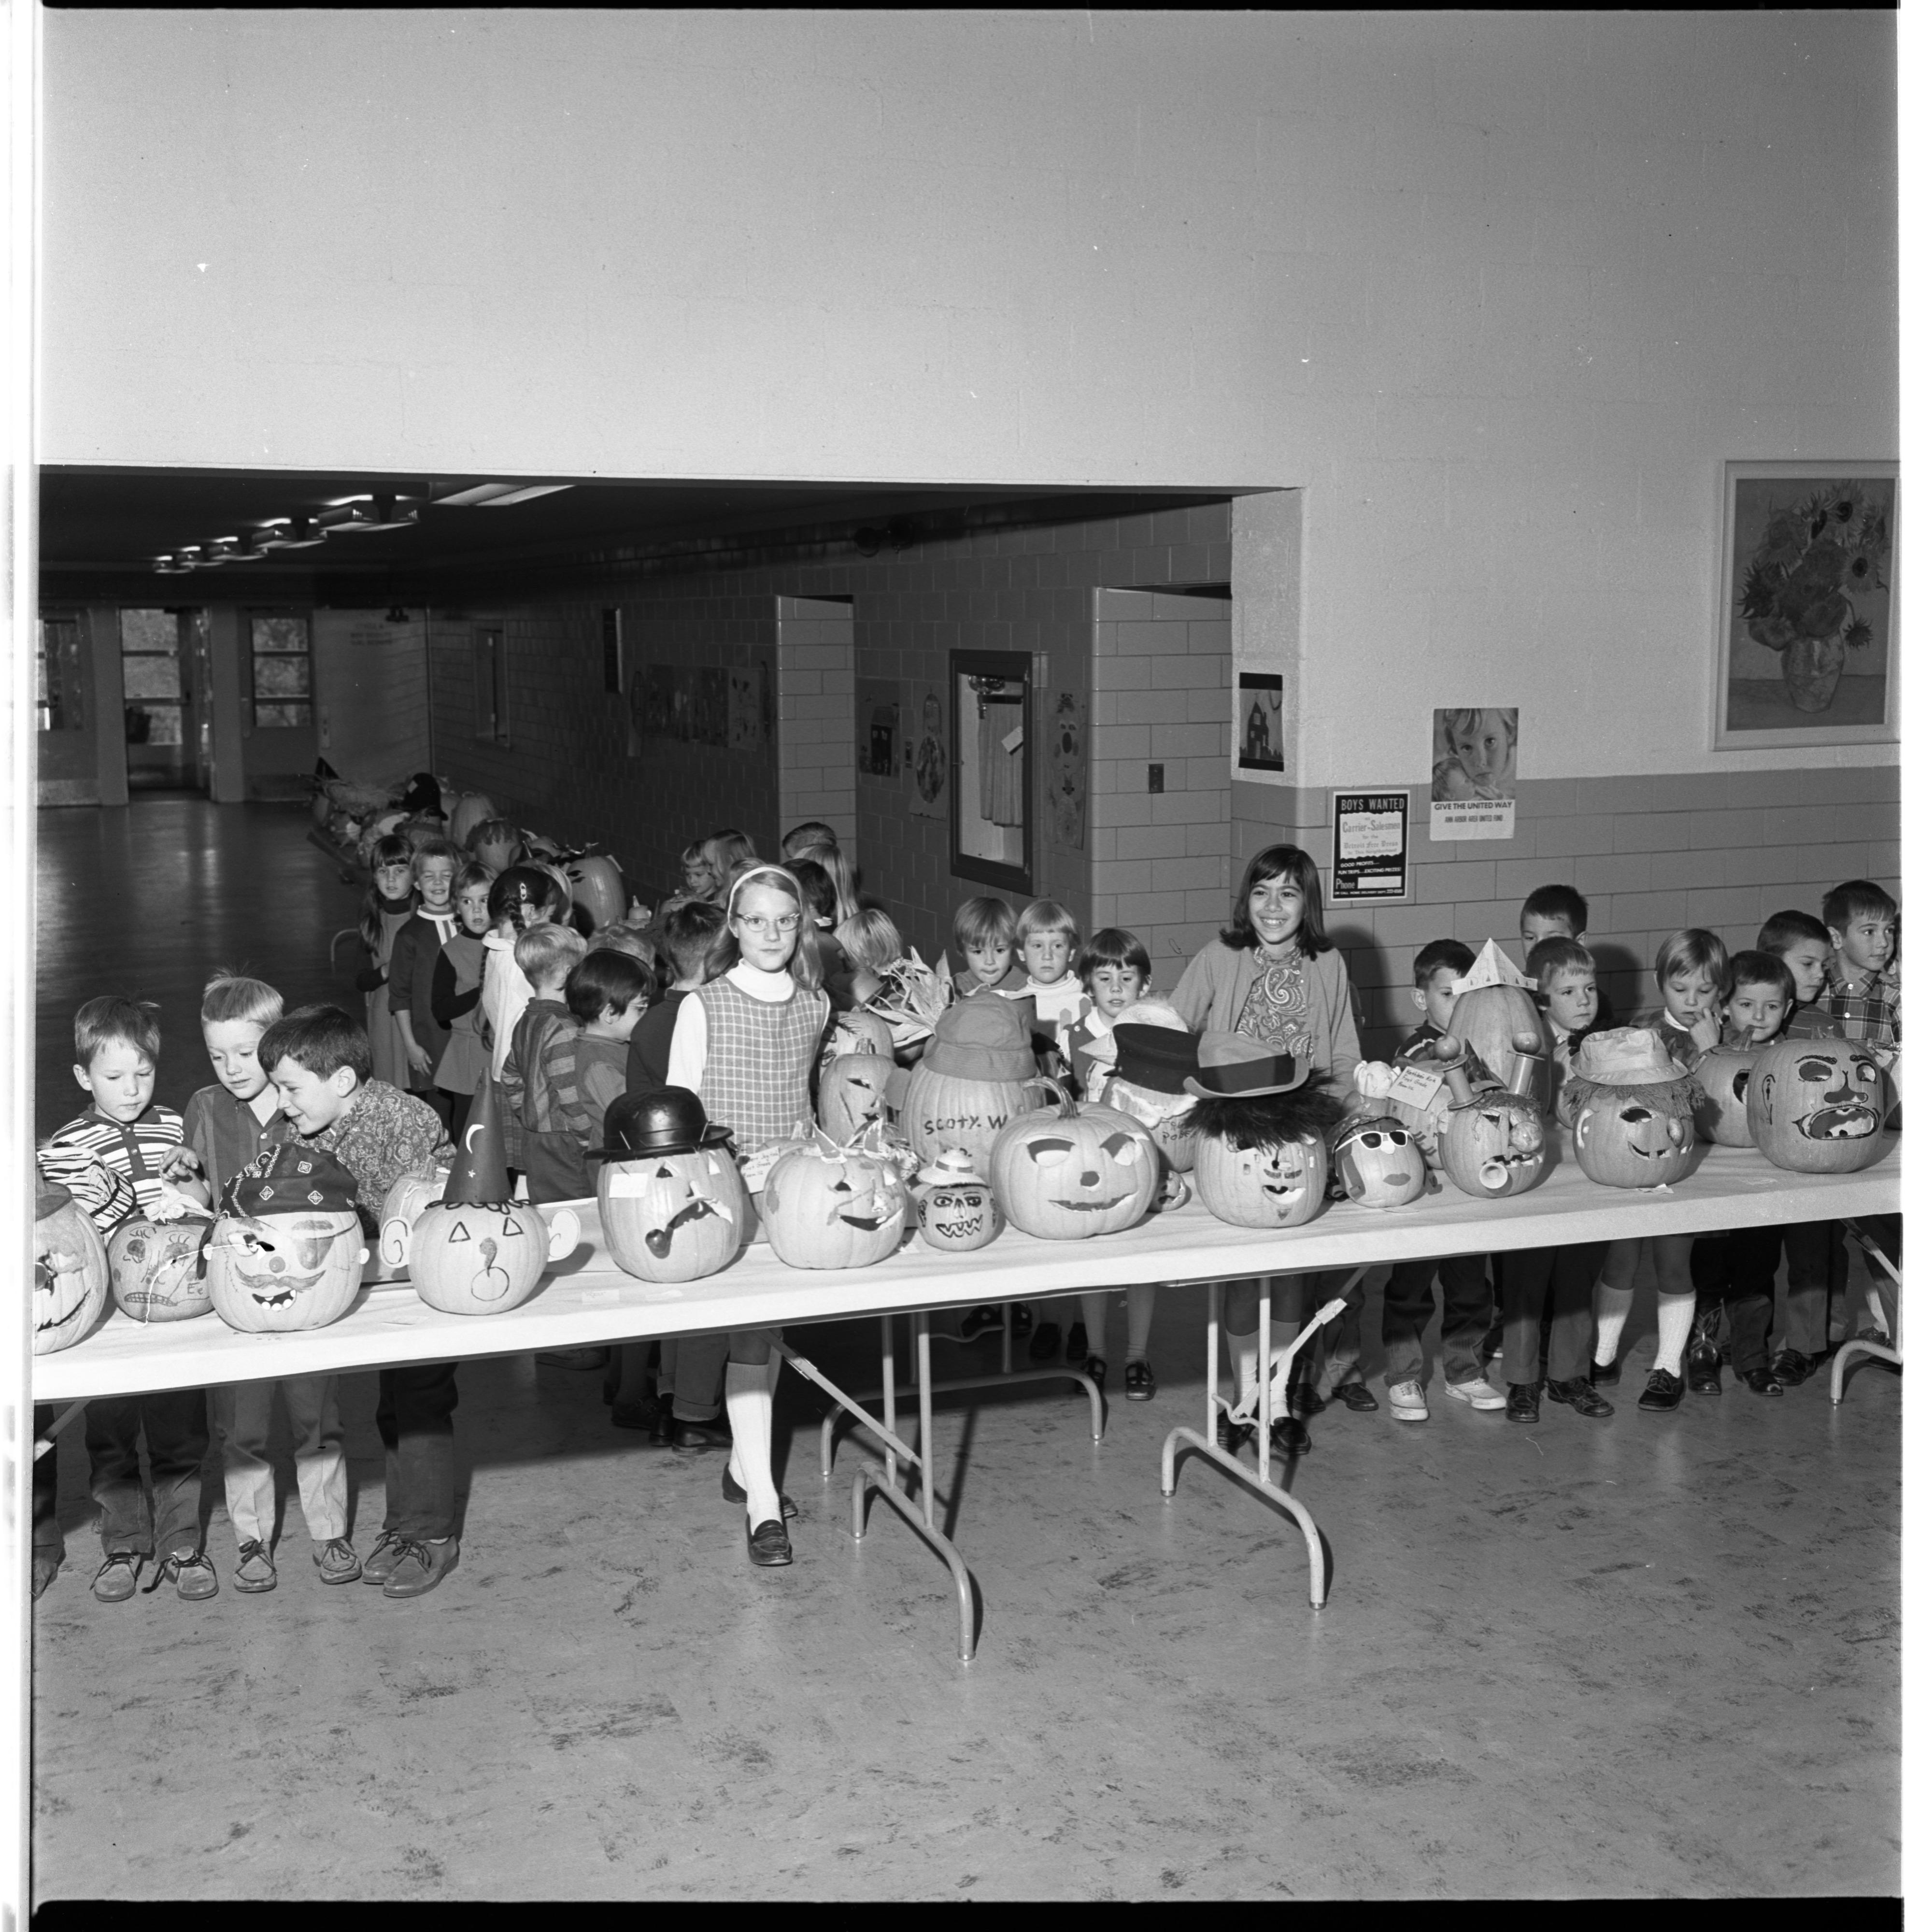 Jack-O-Lantern Display, Eberwhite School, October 1967 image